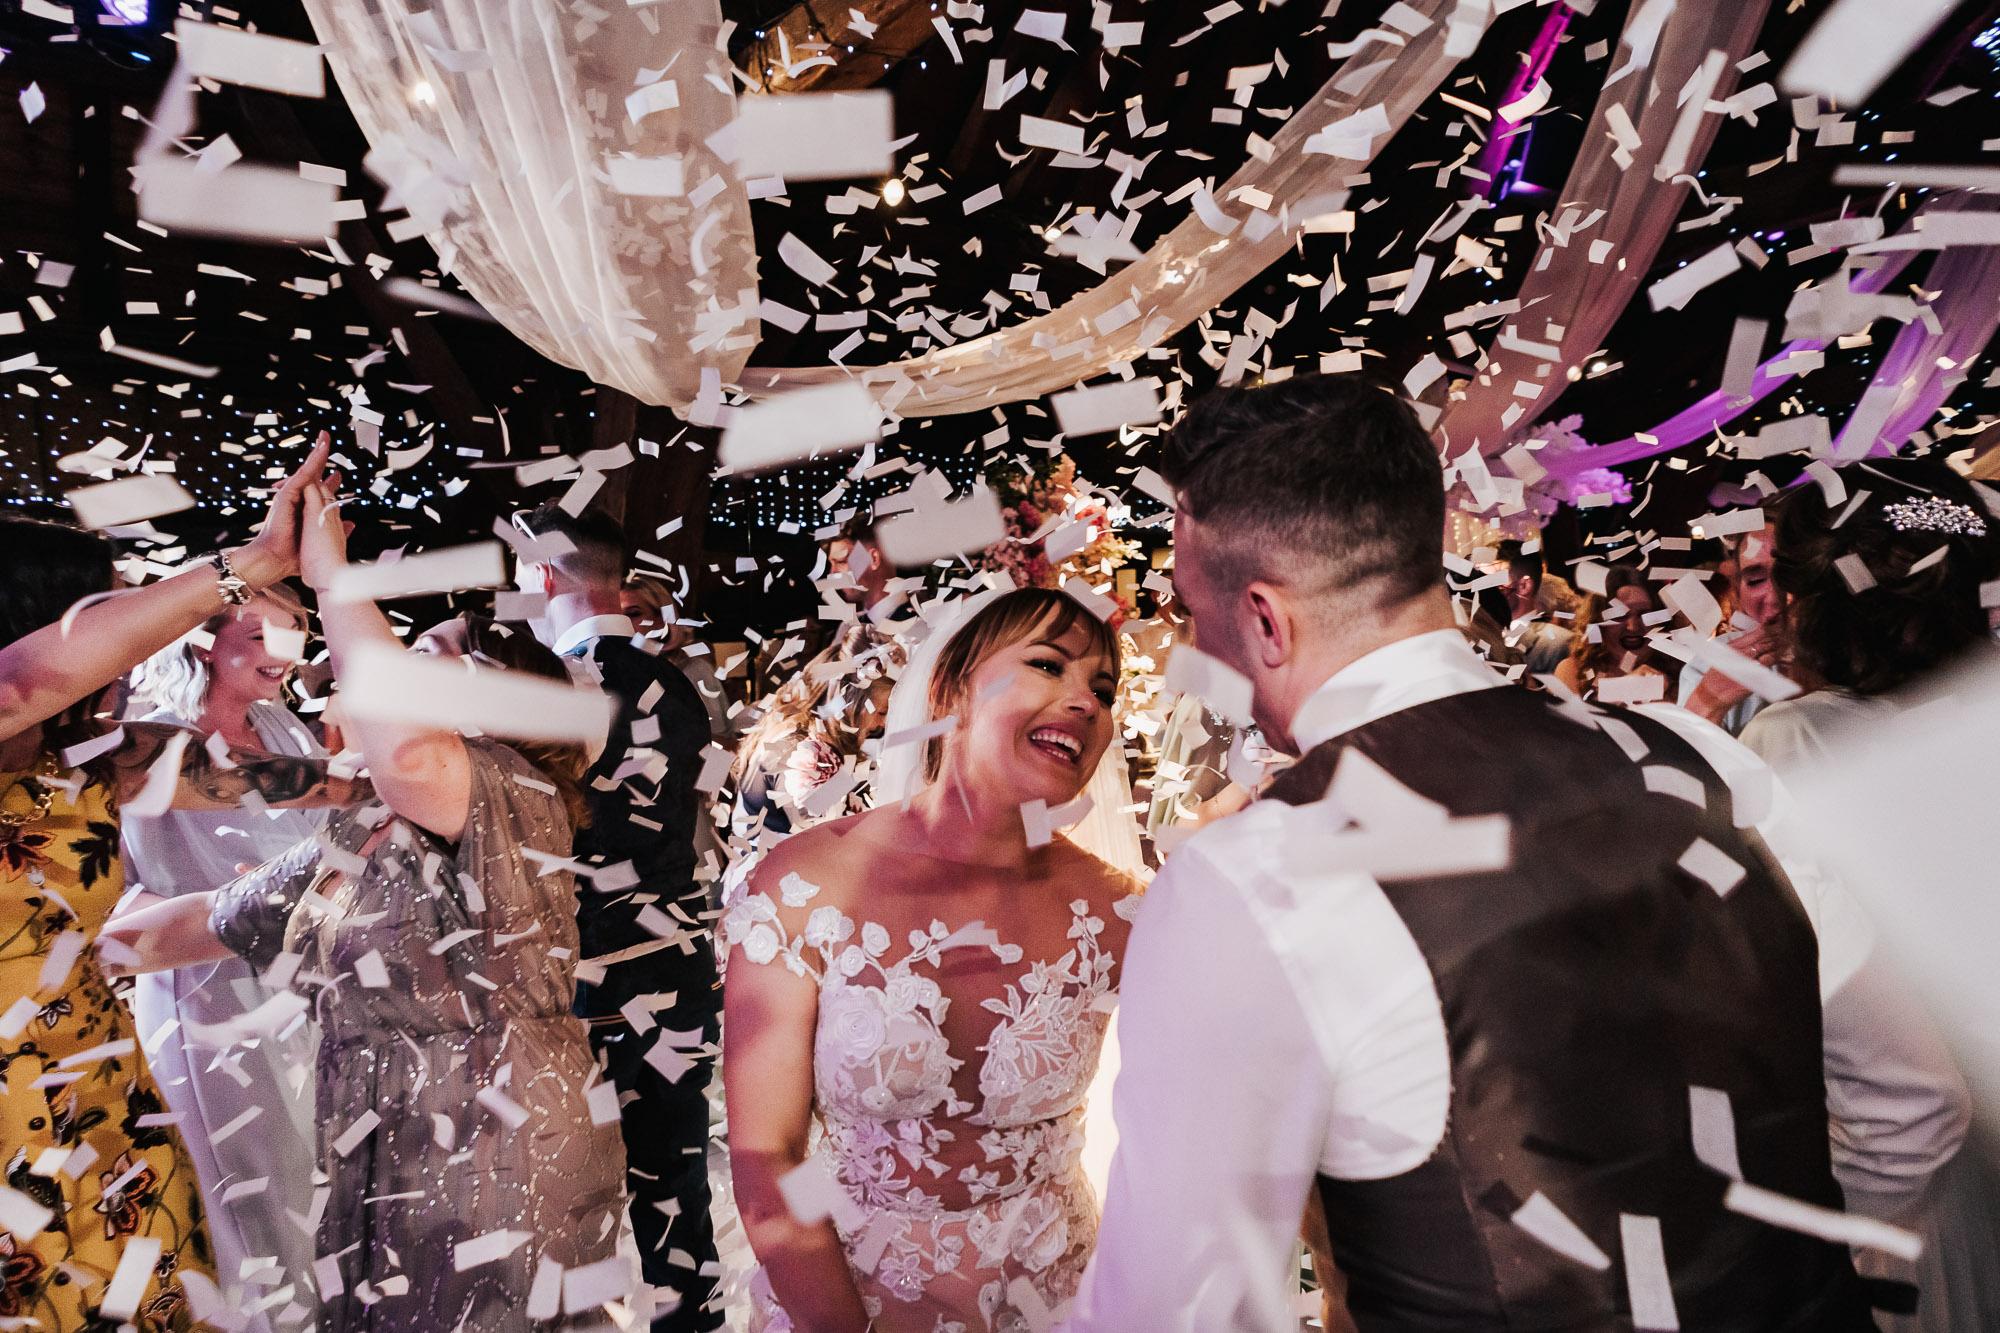 Rivington Hall Barn Wedding PHotographer lancashire wedding photography (33 of 34).jpg